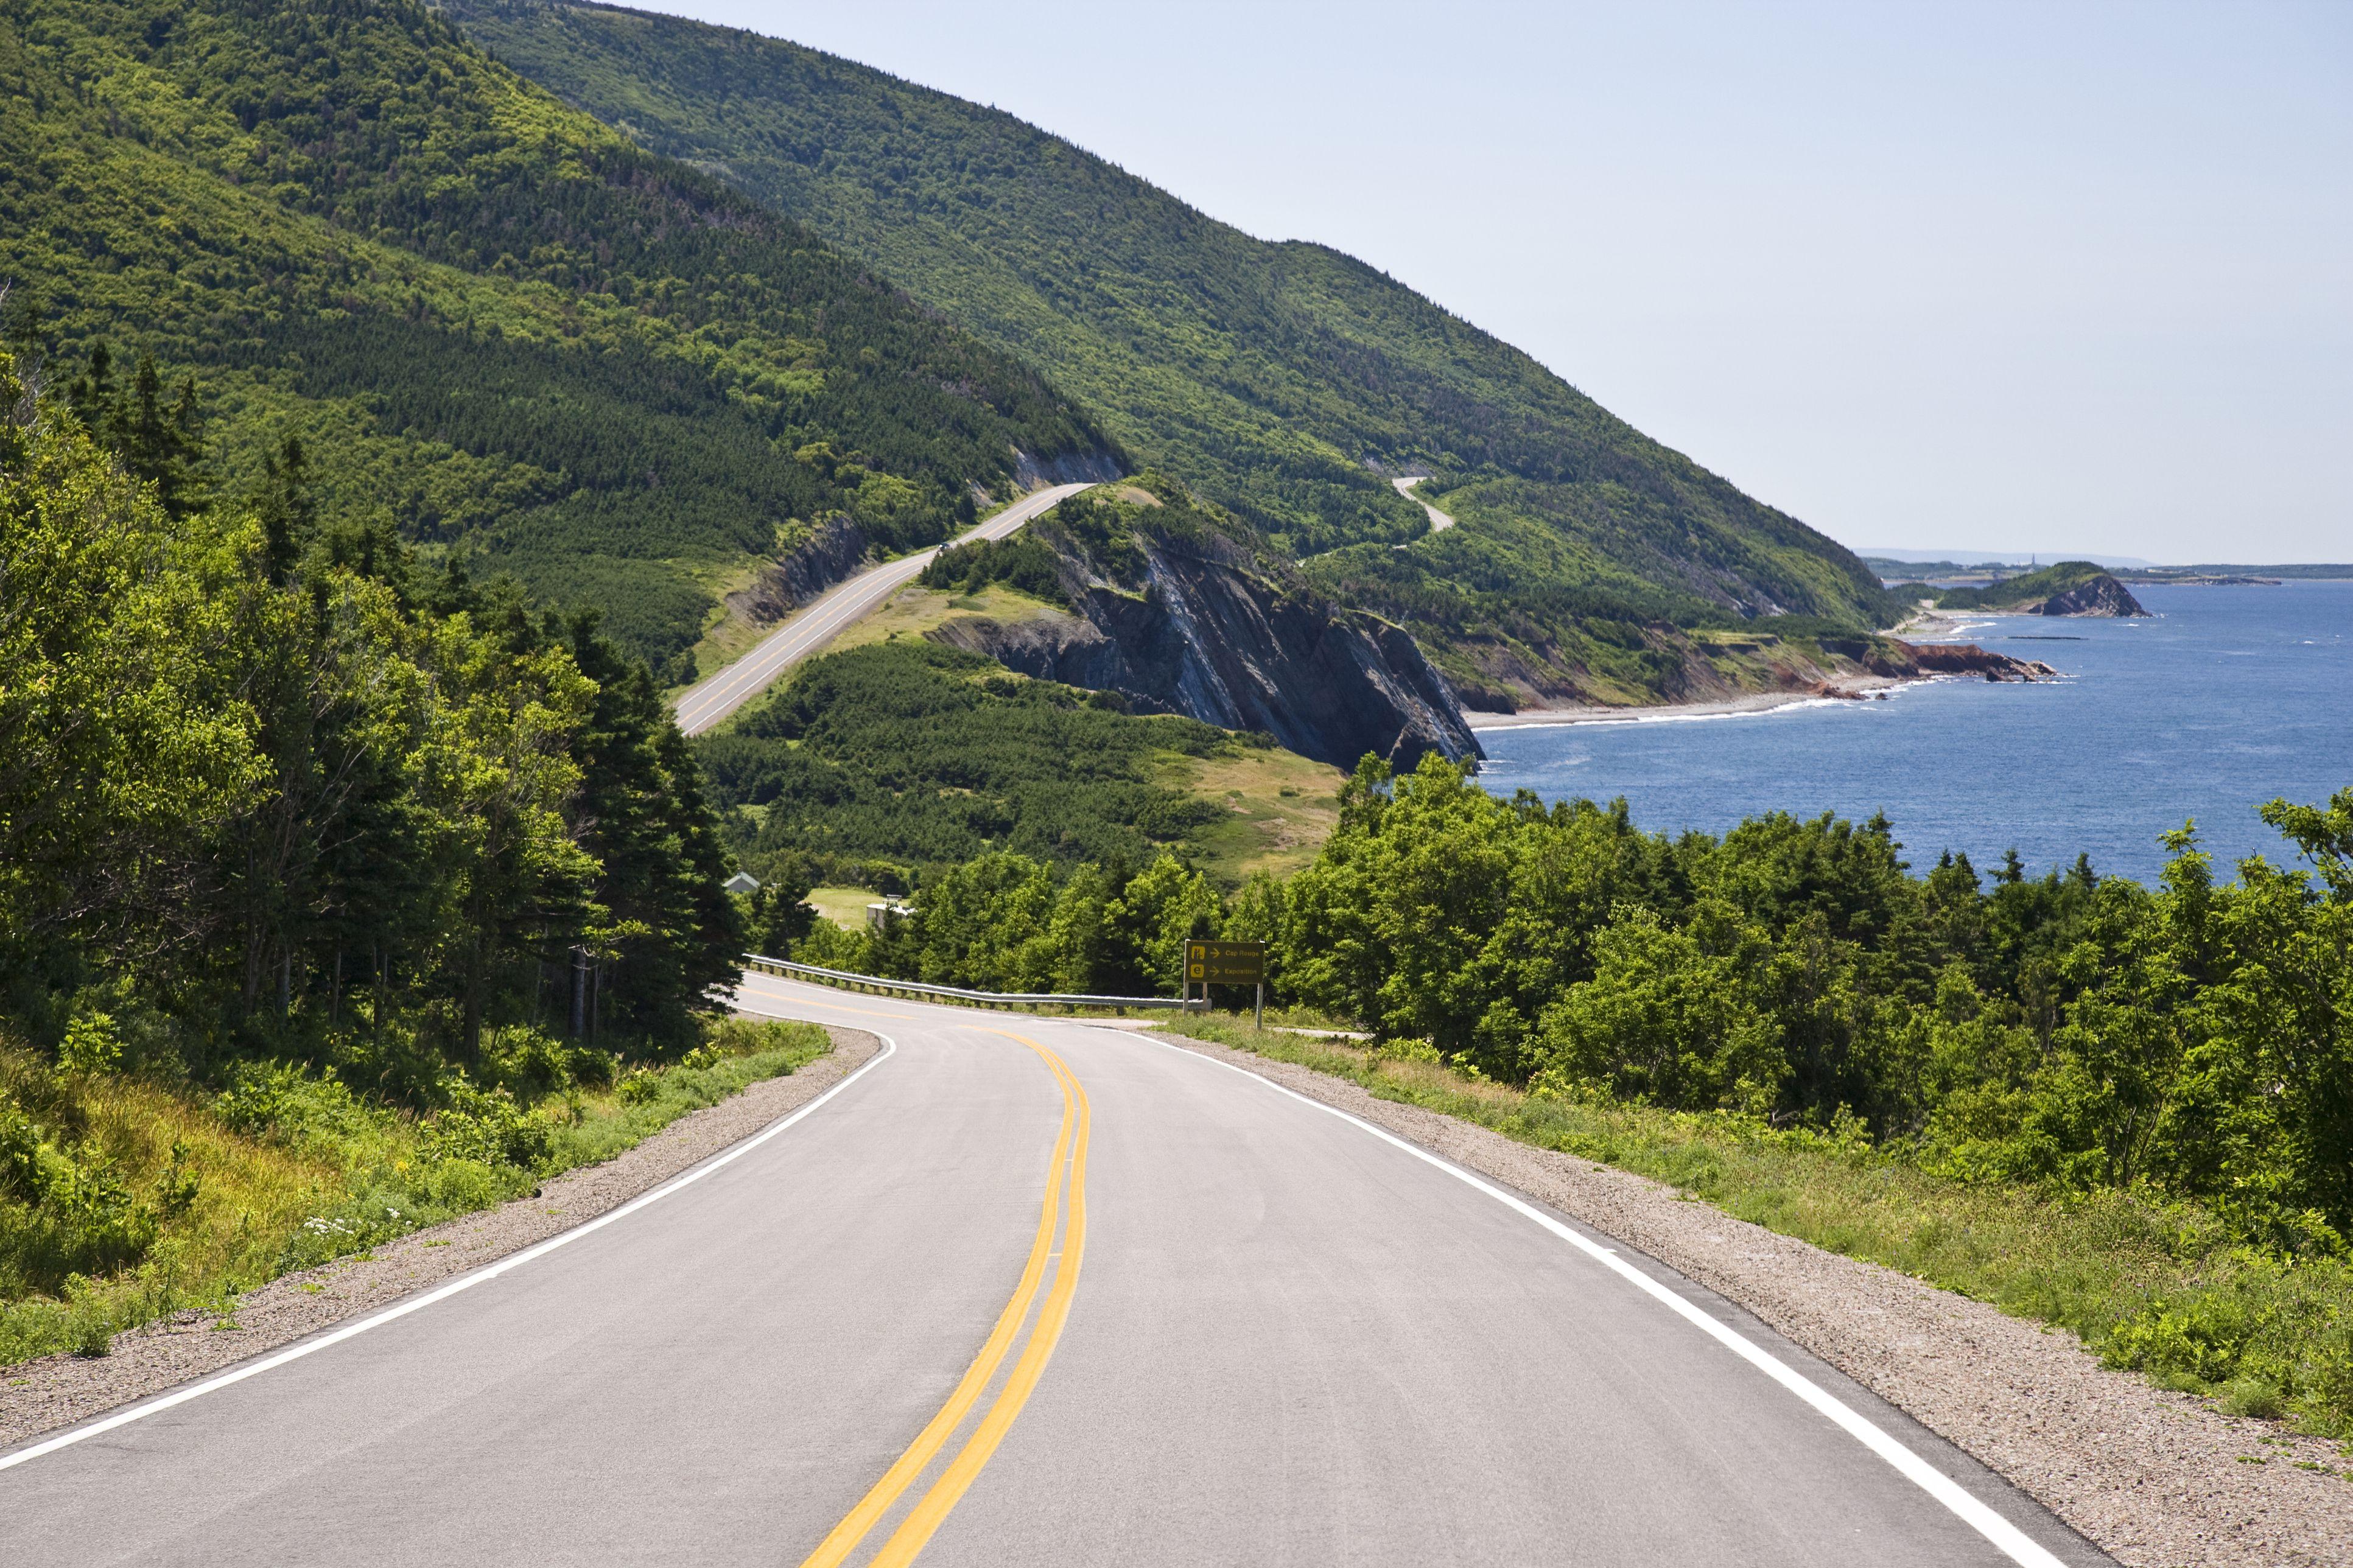 View of Cabot Trail at Cap Rouge, Cape Breton Highlands National Park, Cape Breton Island, Nova Scotia, Canada